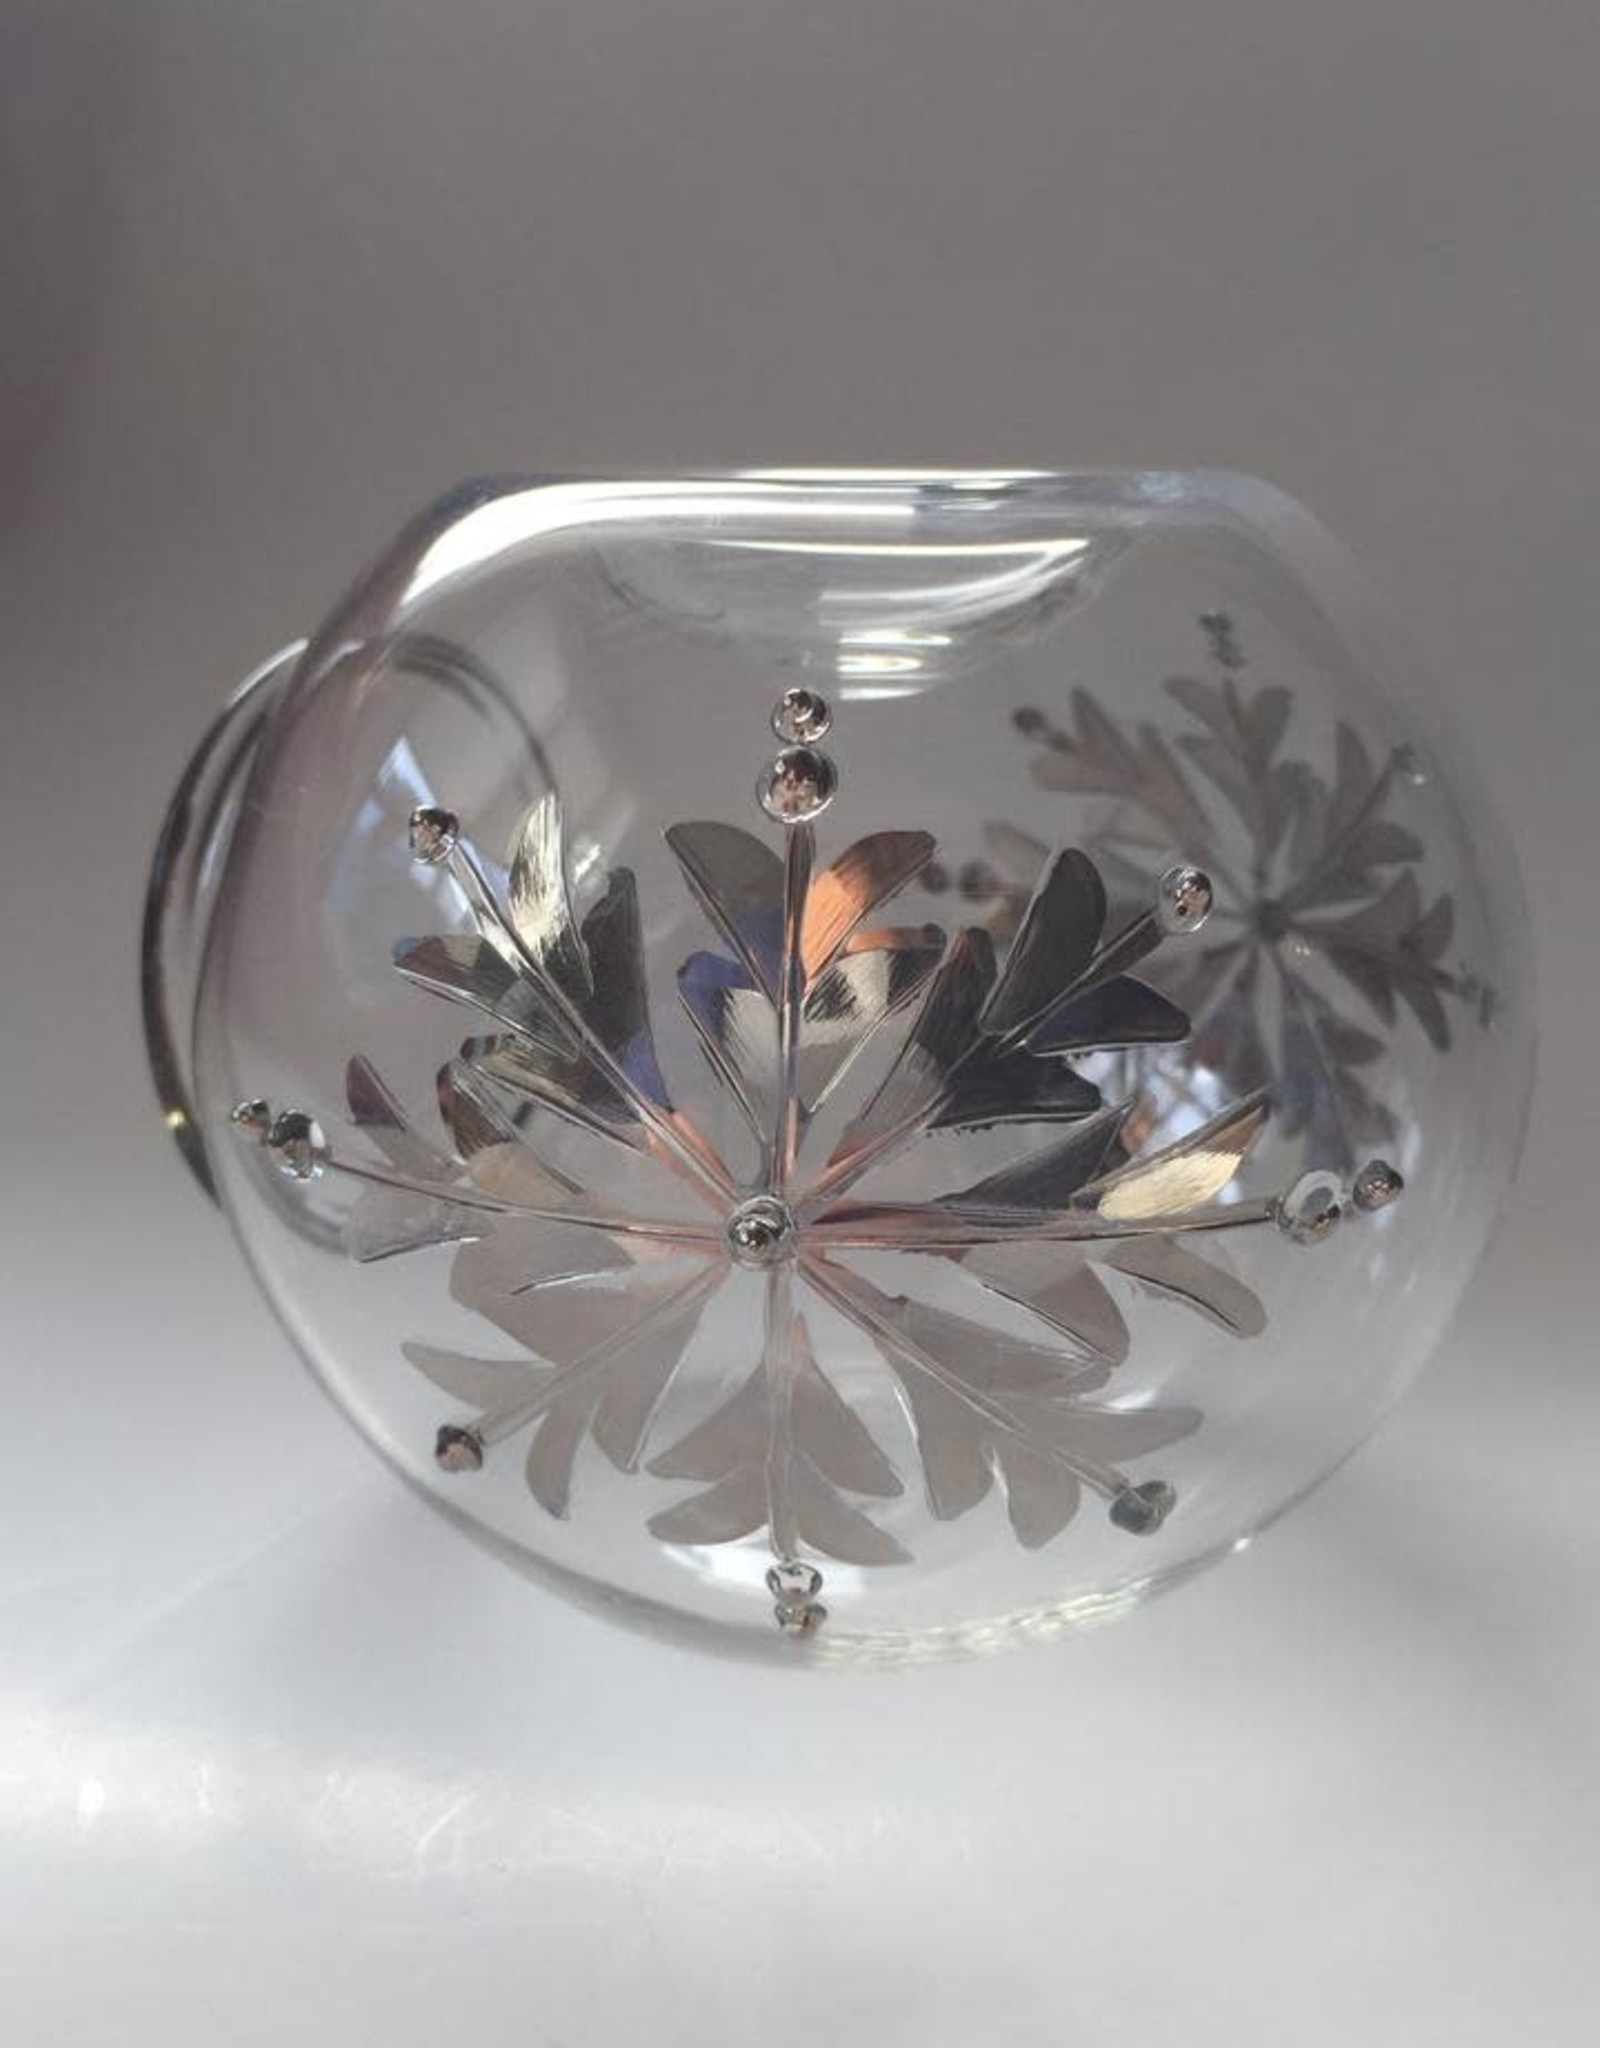 Dandarah Blown Glass Oil Diffuser - Silver Snow Flake